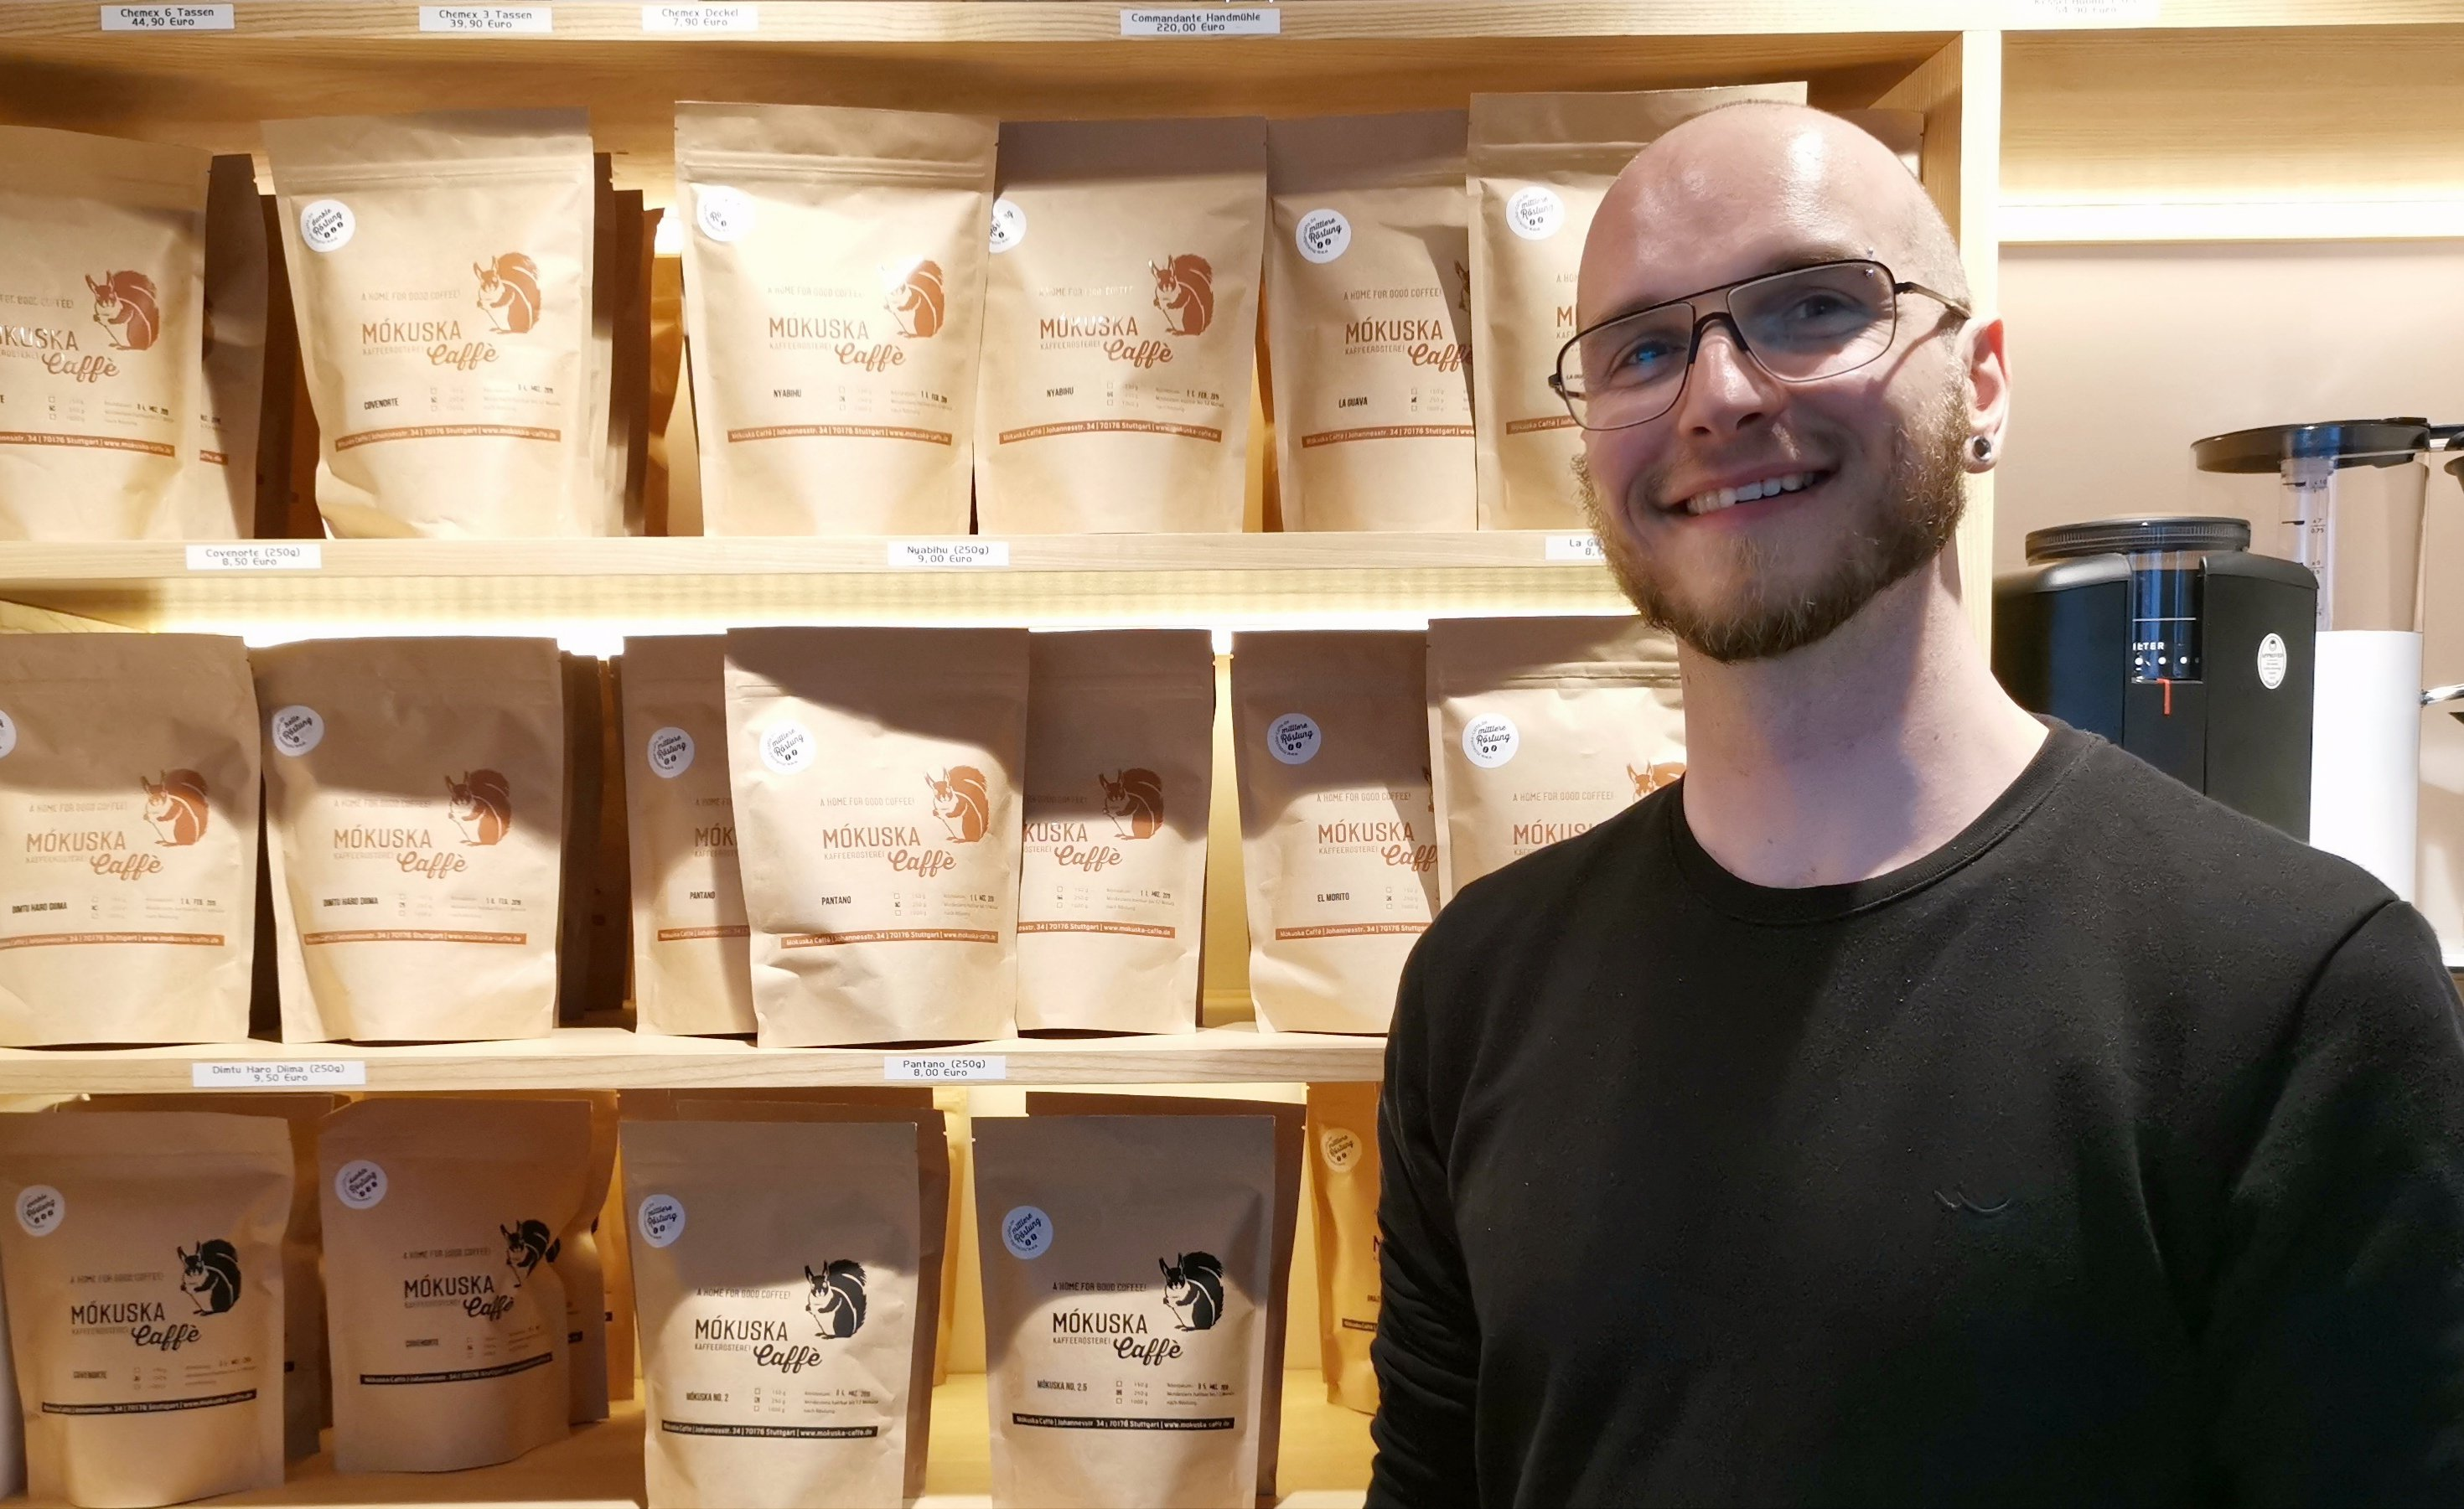 Harald von Mókuska Caffè